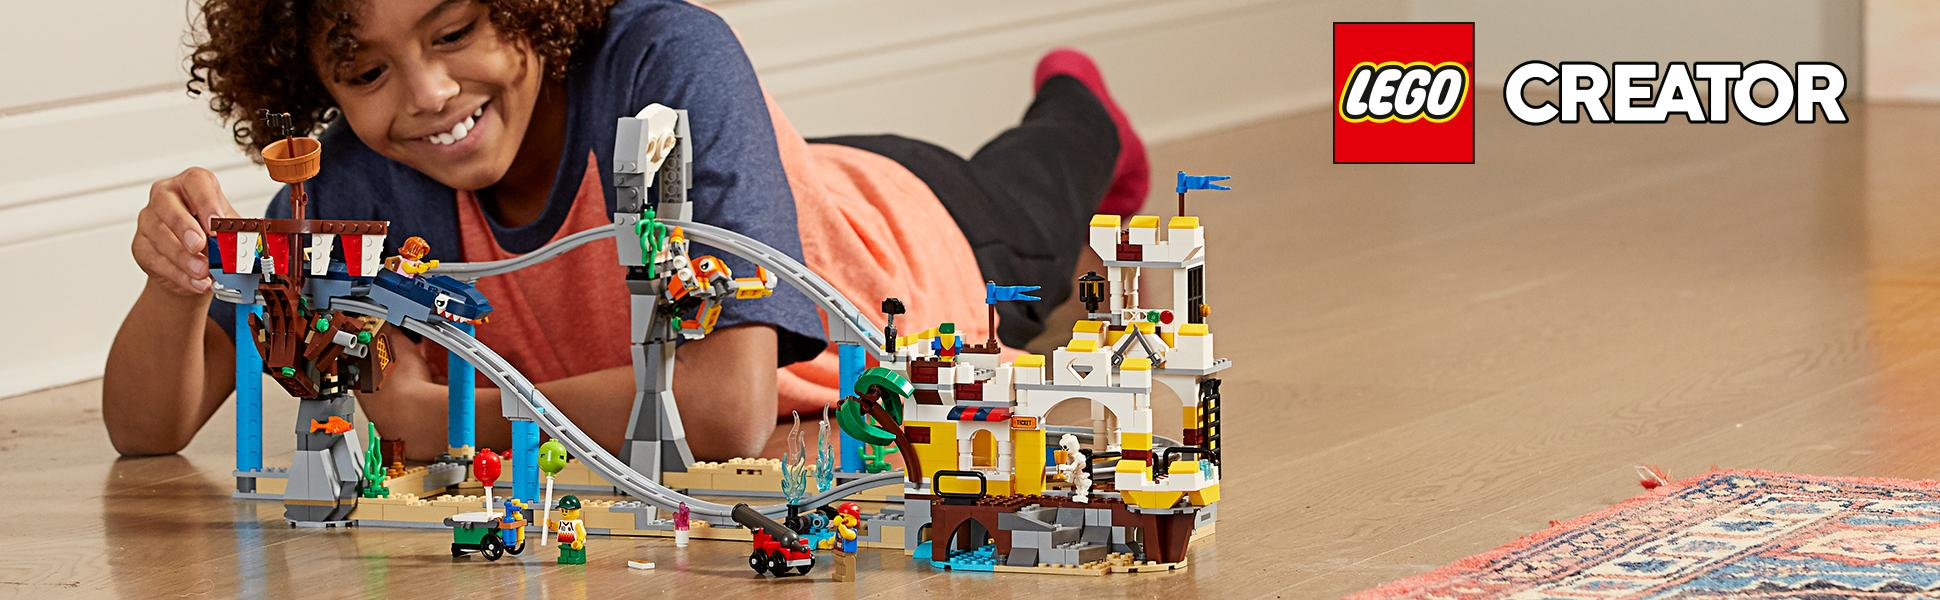 LEGO Creator Pirate Roller Coaster Set 31084- Brand New Sealed Box ...